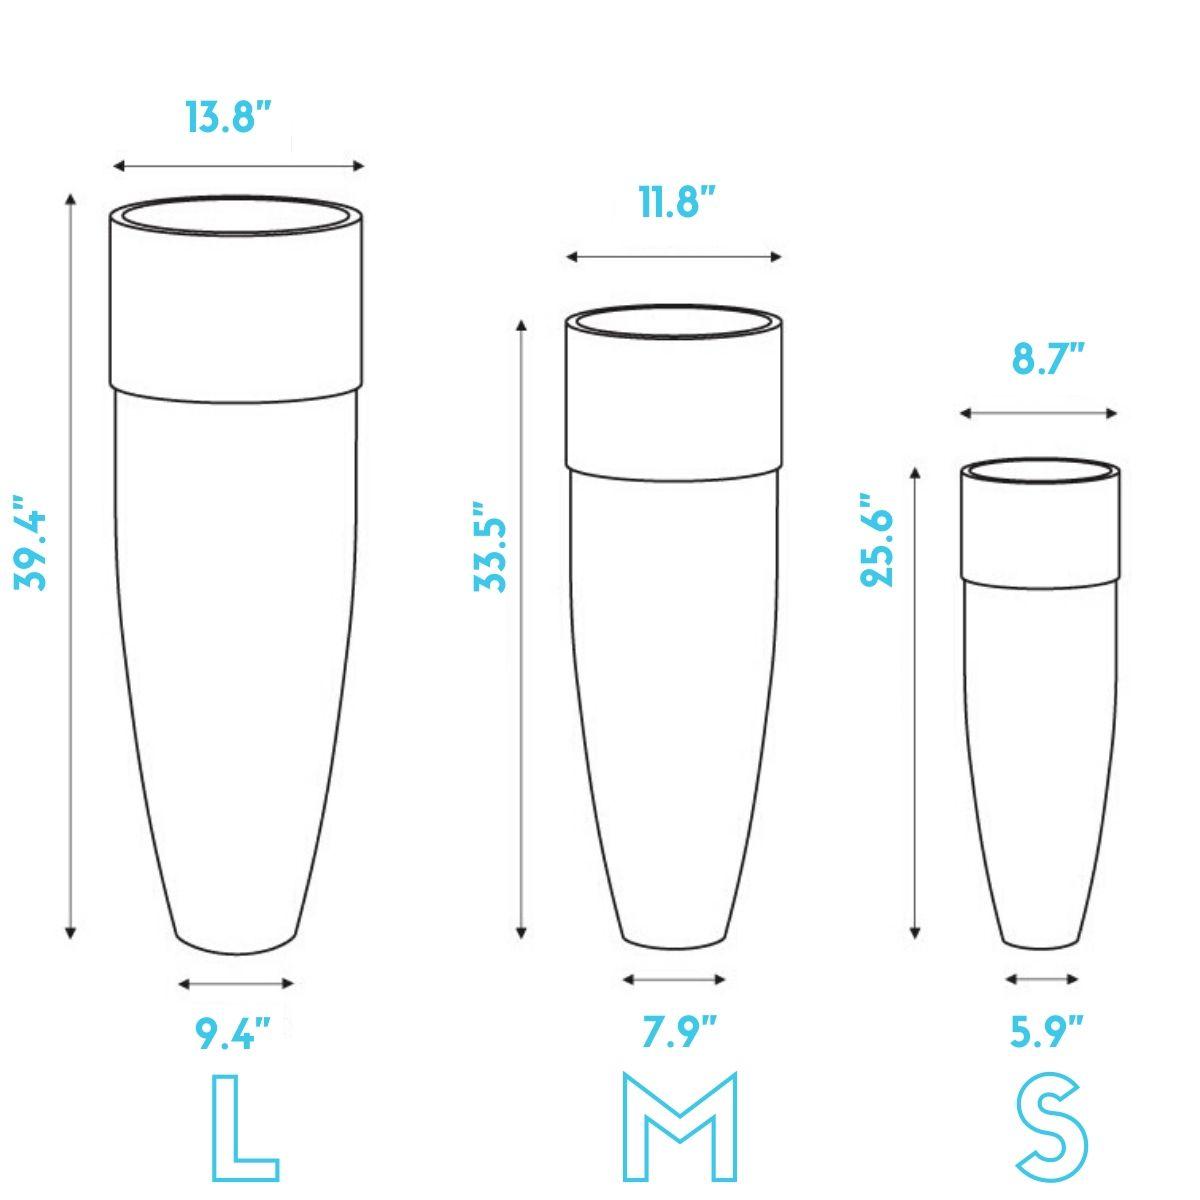 longtom-planter-sizes-dimensions